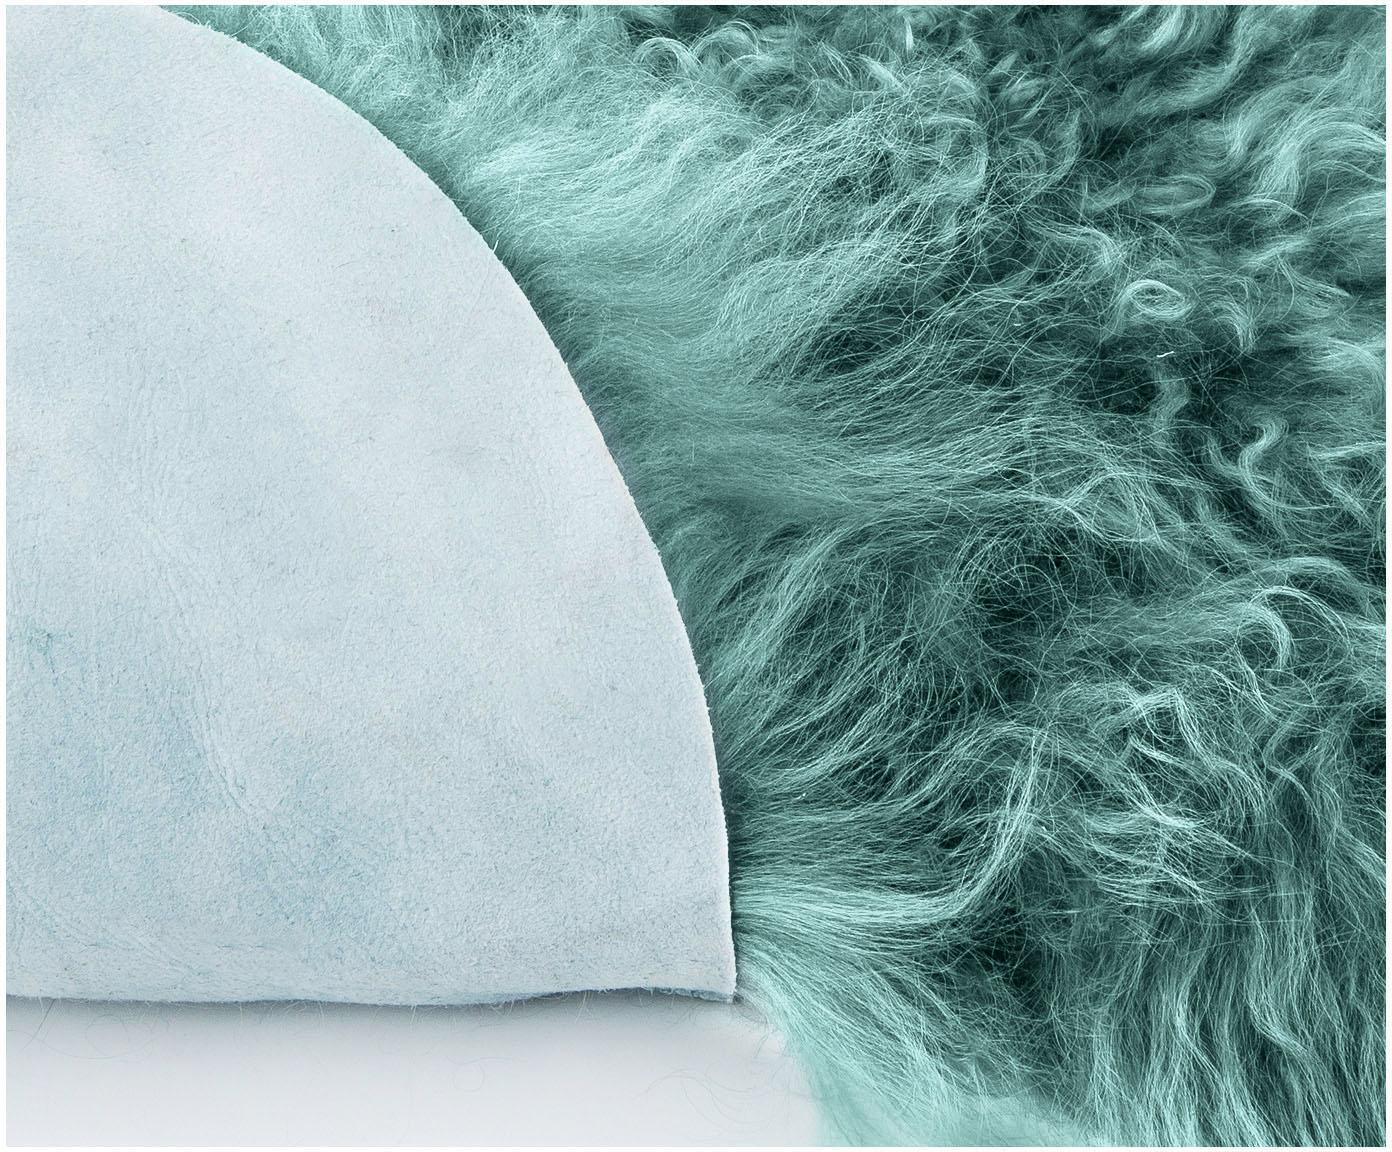 Langhaar-Lammfell Ella, gelockt, Vorderseite: 100% mongolisches Lammfel, Rückseite: 100% Leder, Dunkles Türkis, 50 x 160 cm